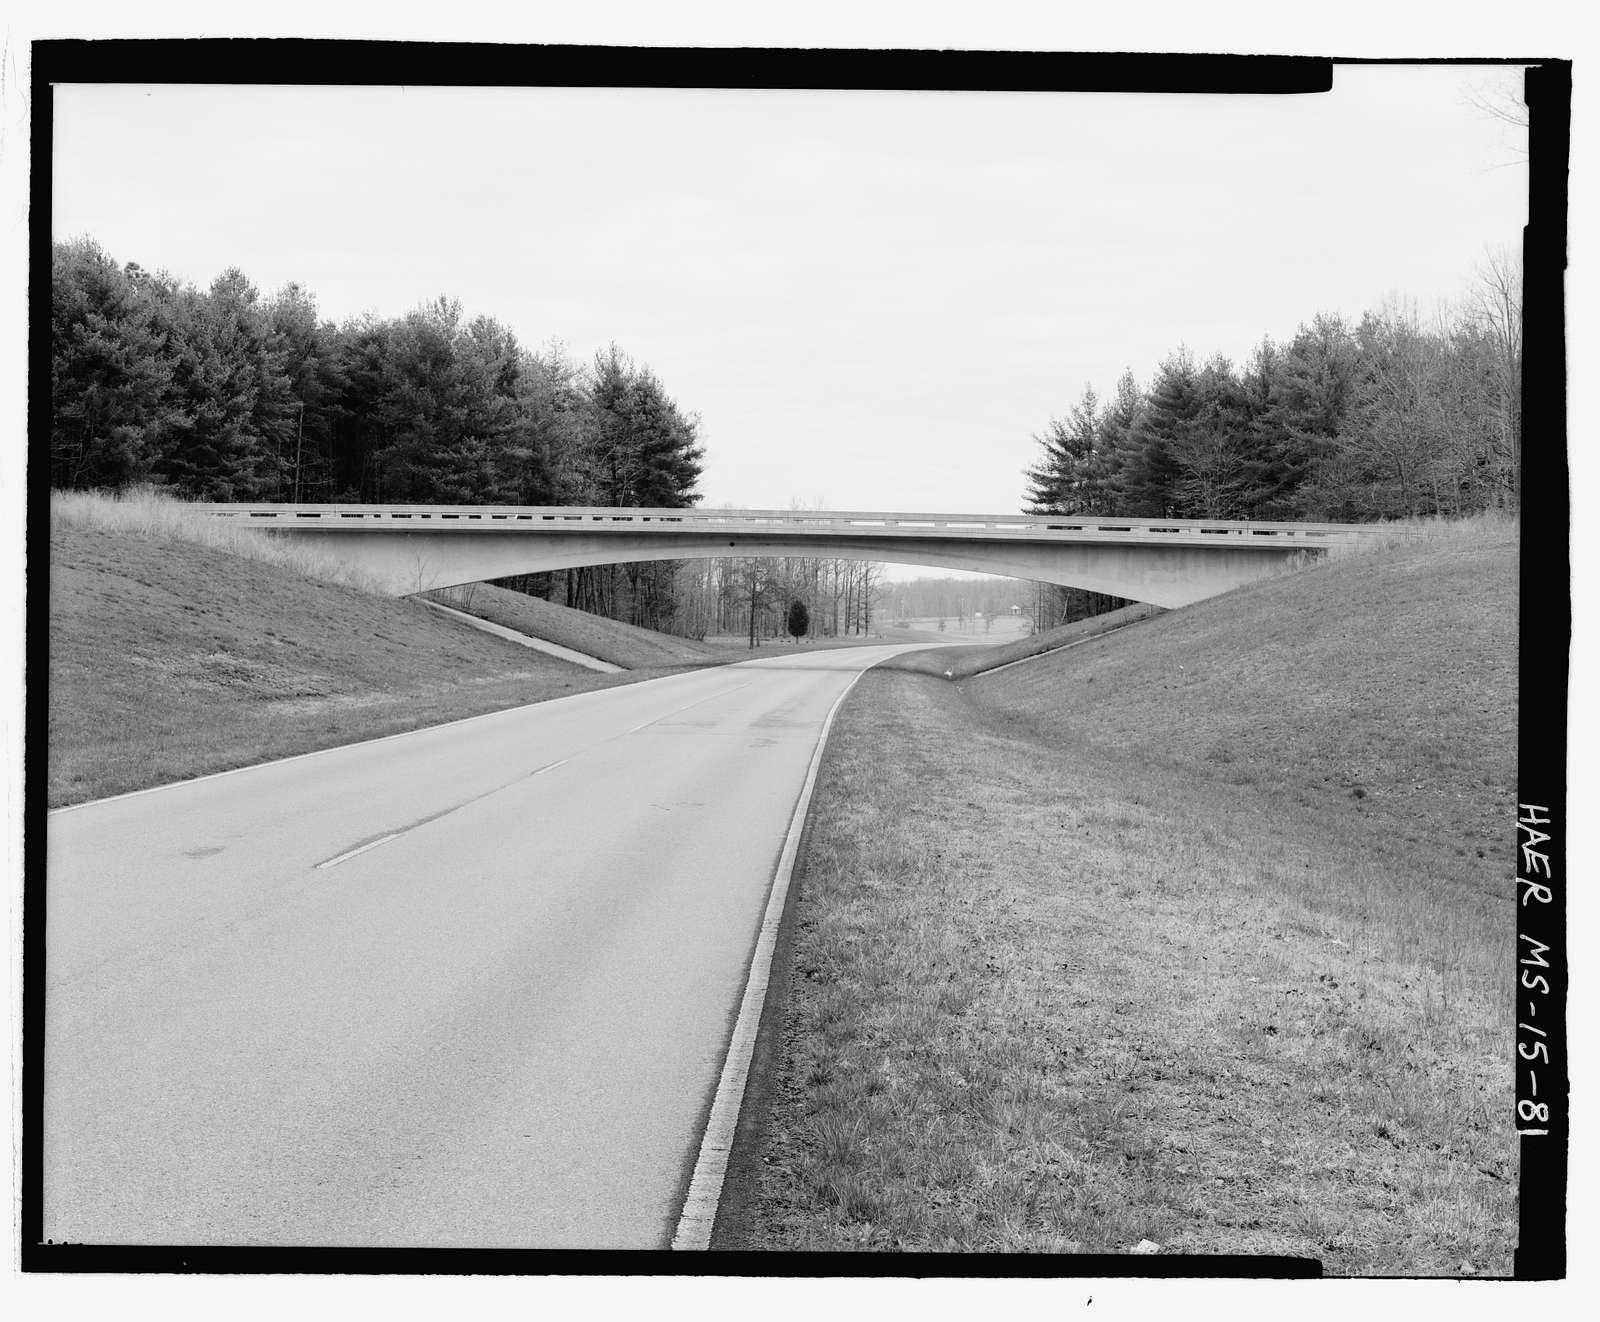 Natchez Trace Parkway, Located between Natchez, MS & Nashville, TN, Tupelo, Lee County, MS